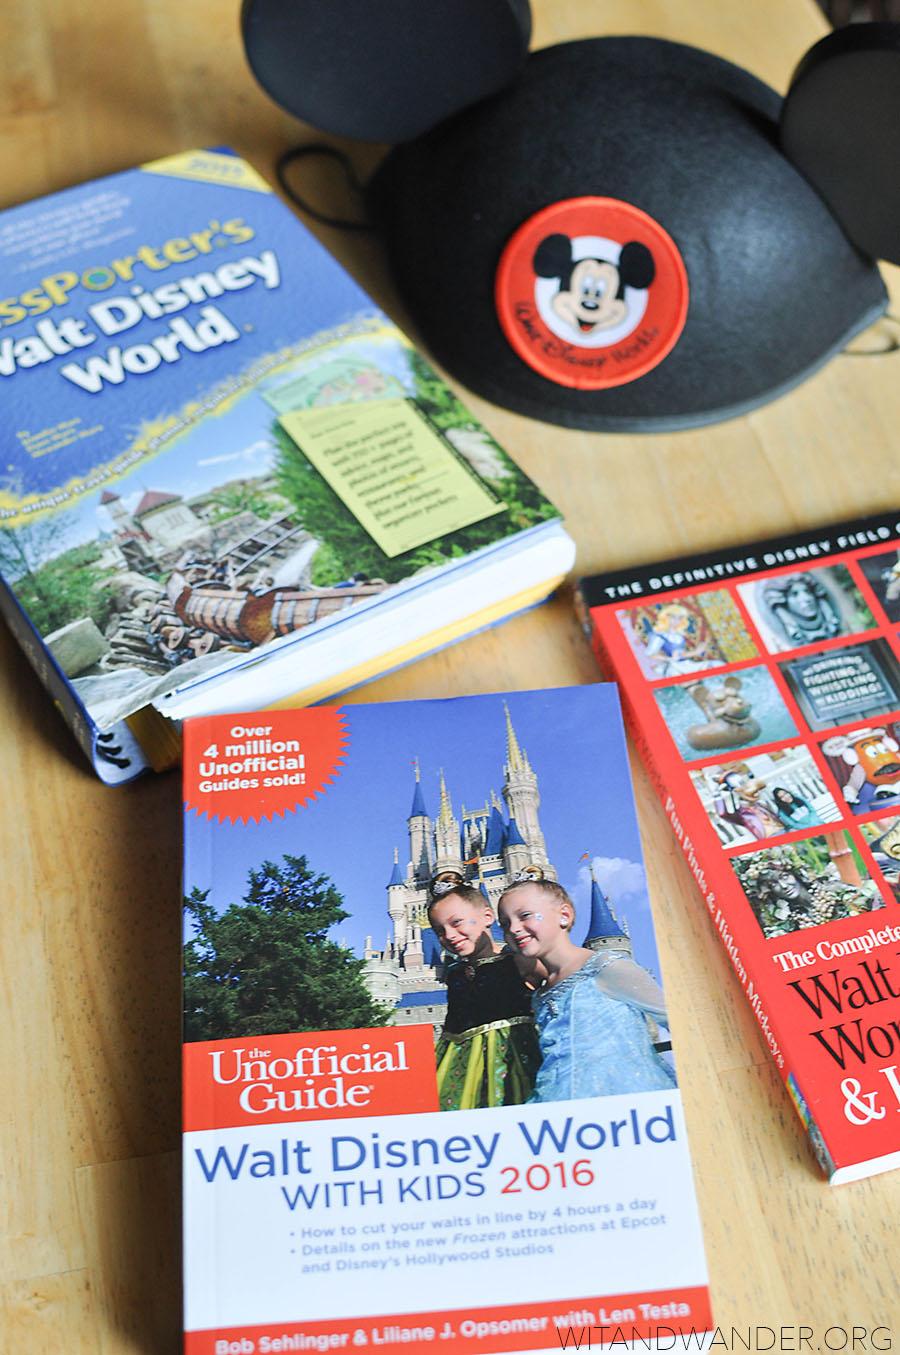 The Best Top 5 Walt Disney World Planning Books | Wit & Wander